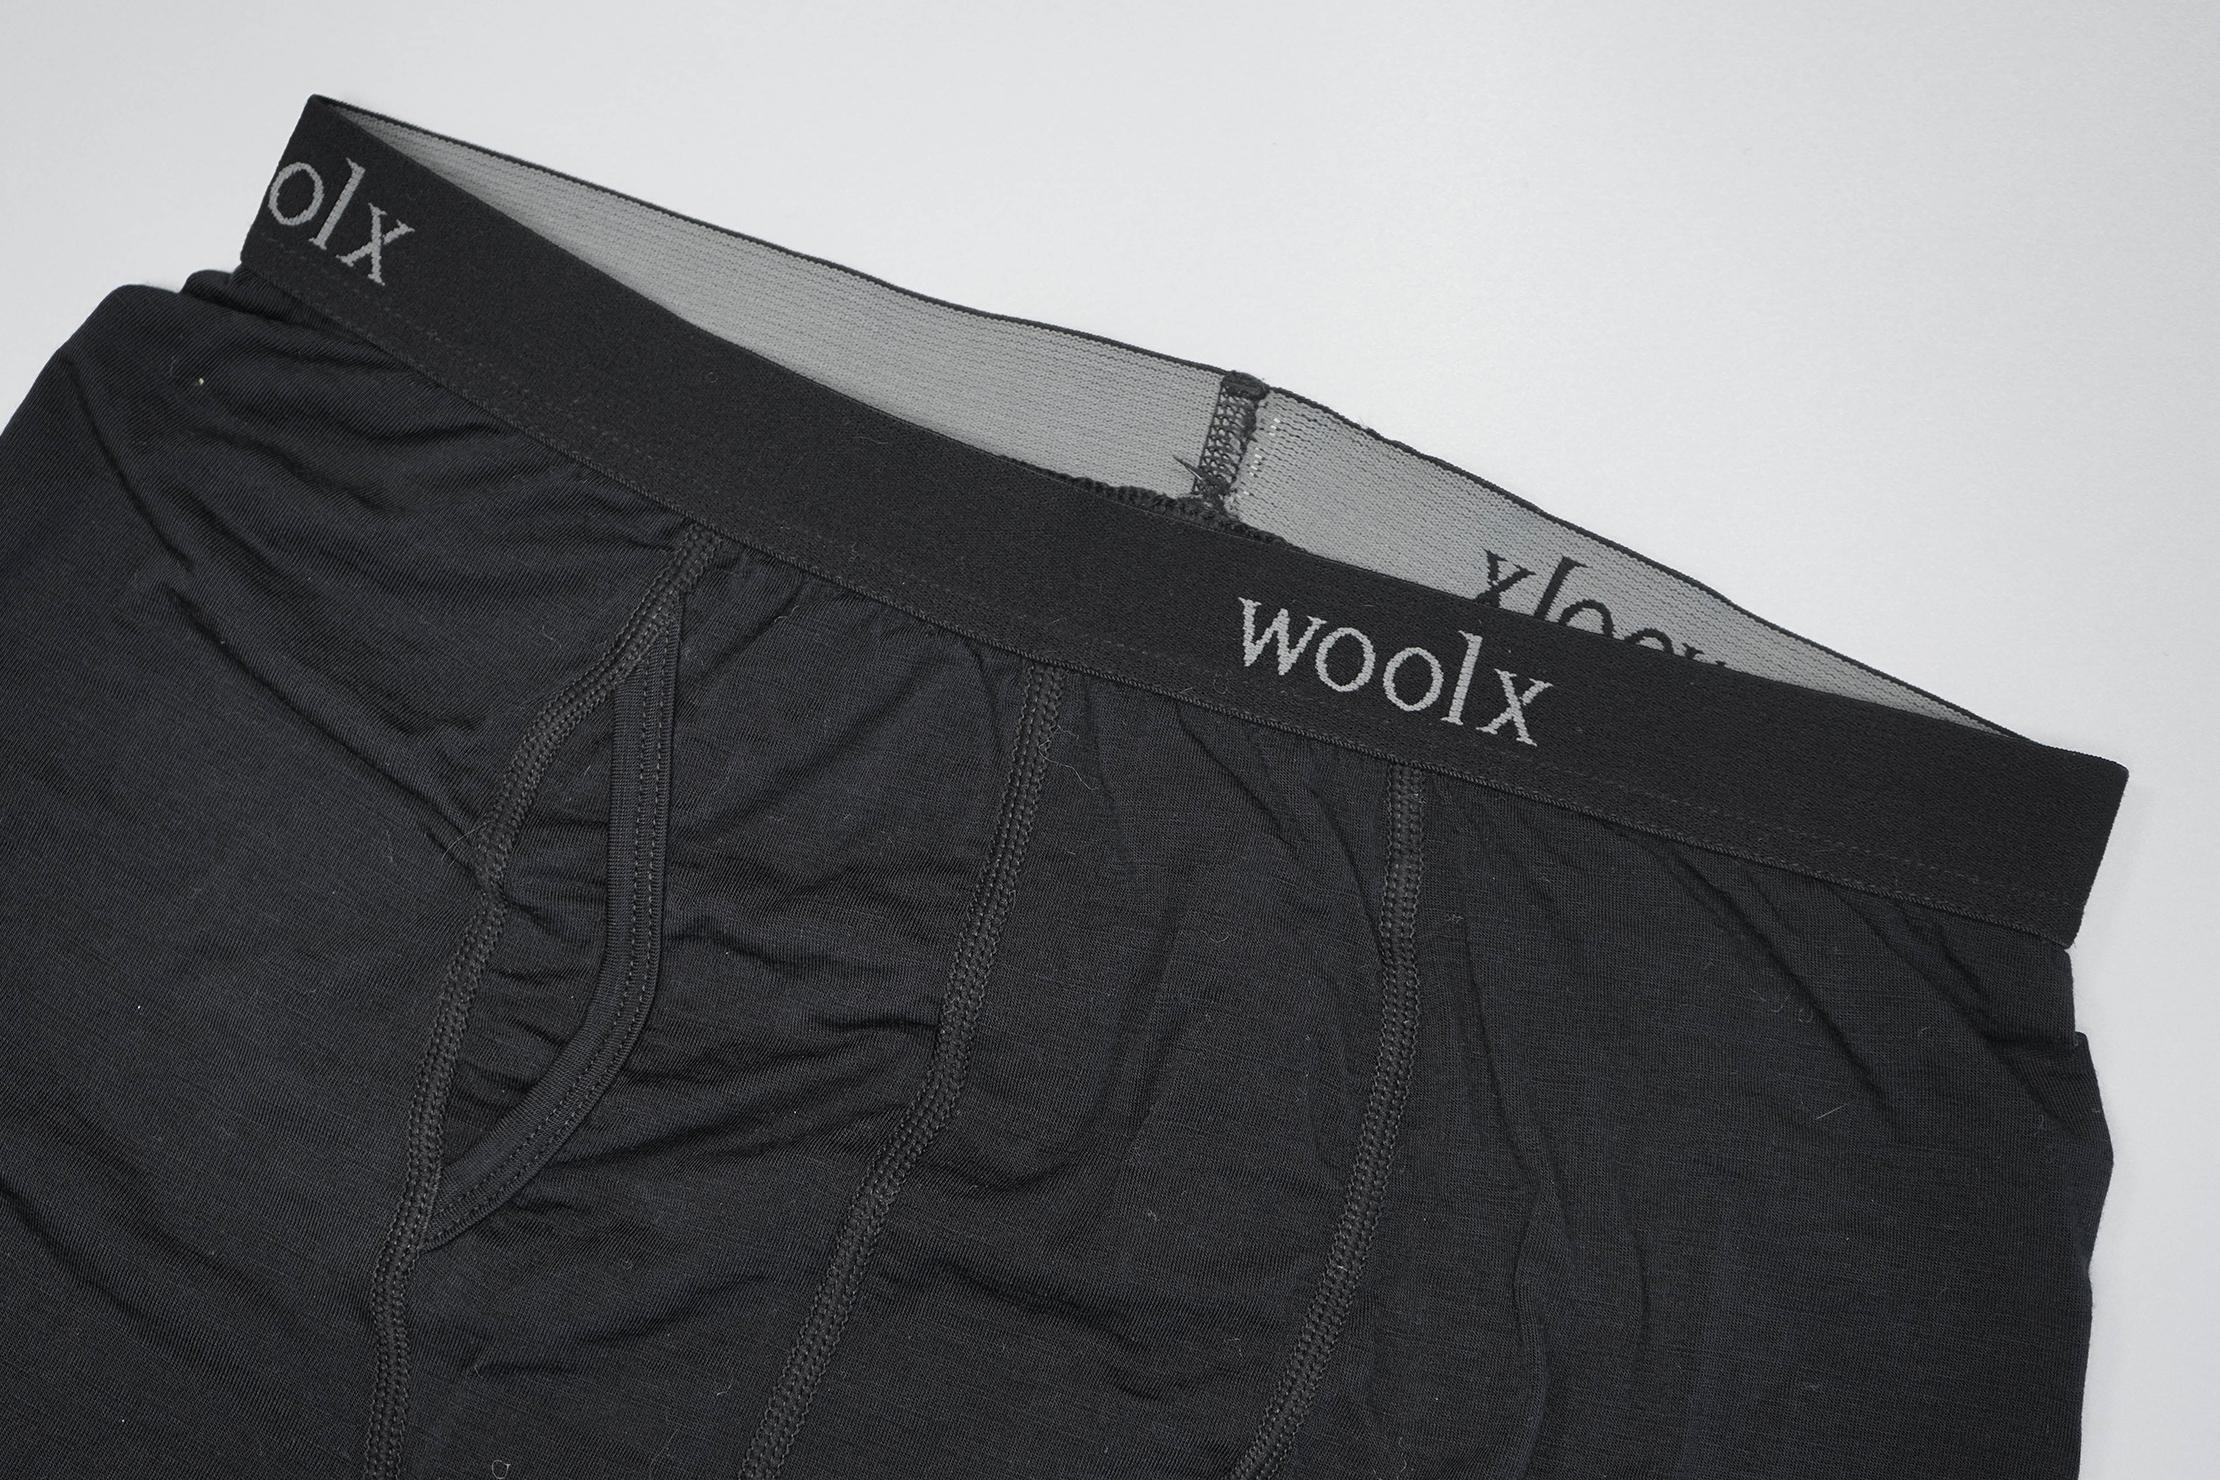 Woolx Reaction Boxer Brief Waistband